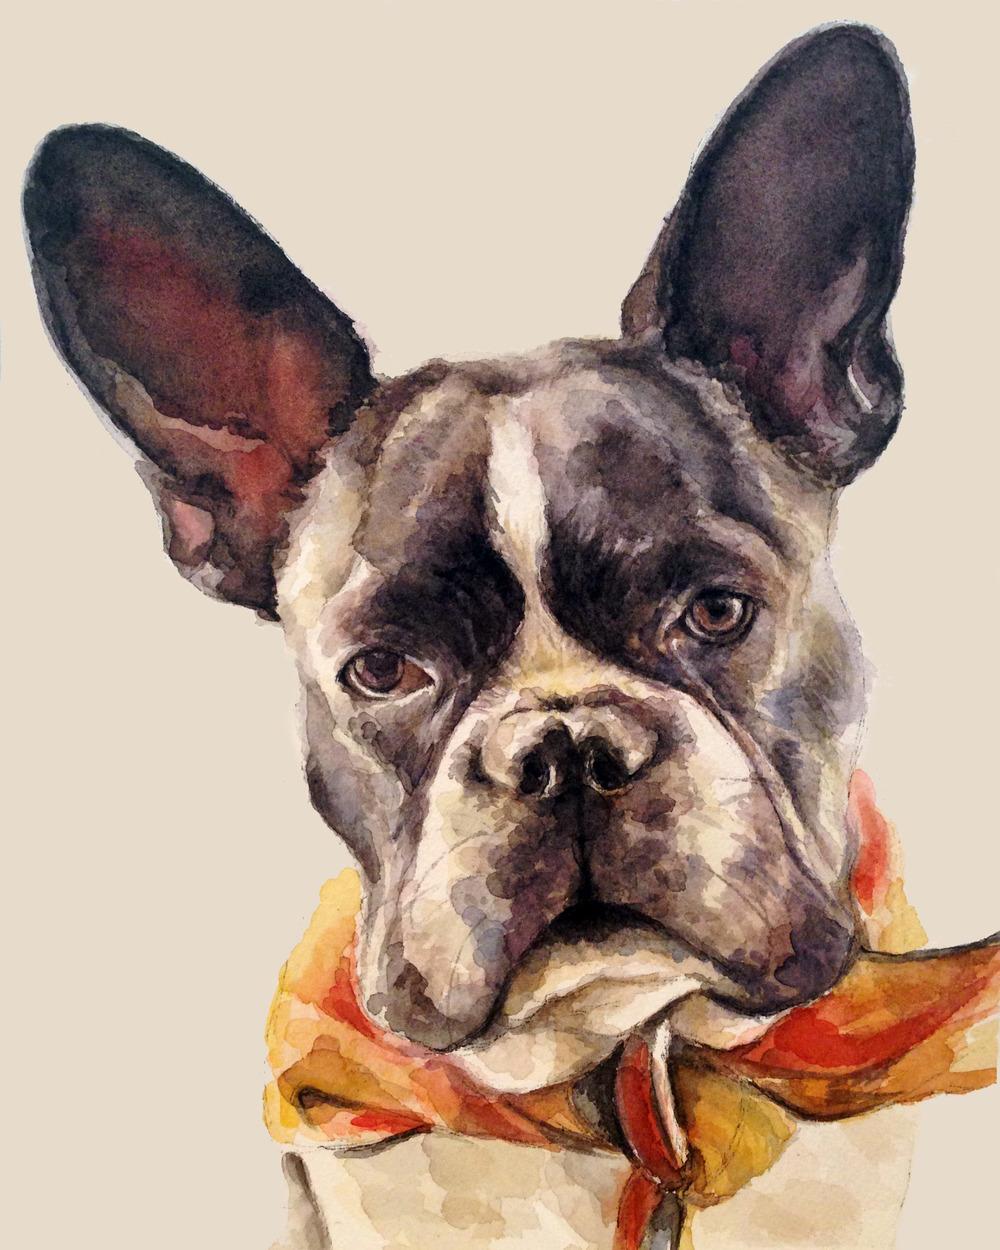 Gus the French bulldog